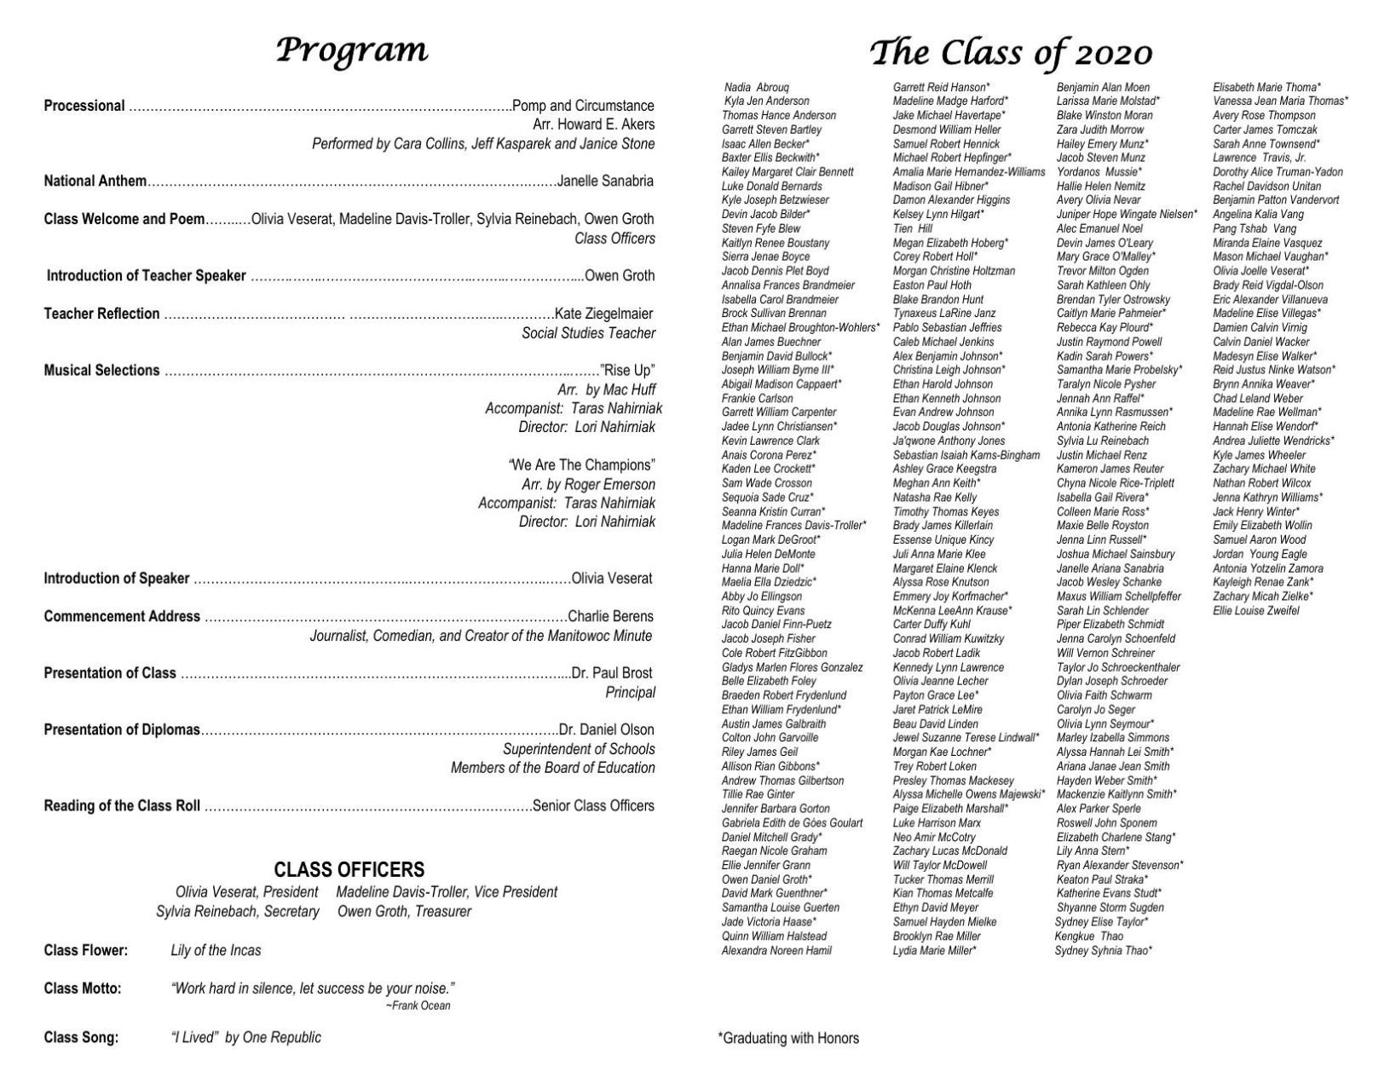 Monona Grove High School Commencement Program